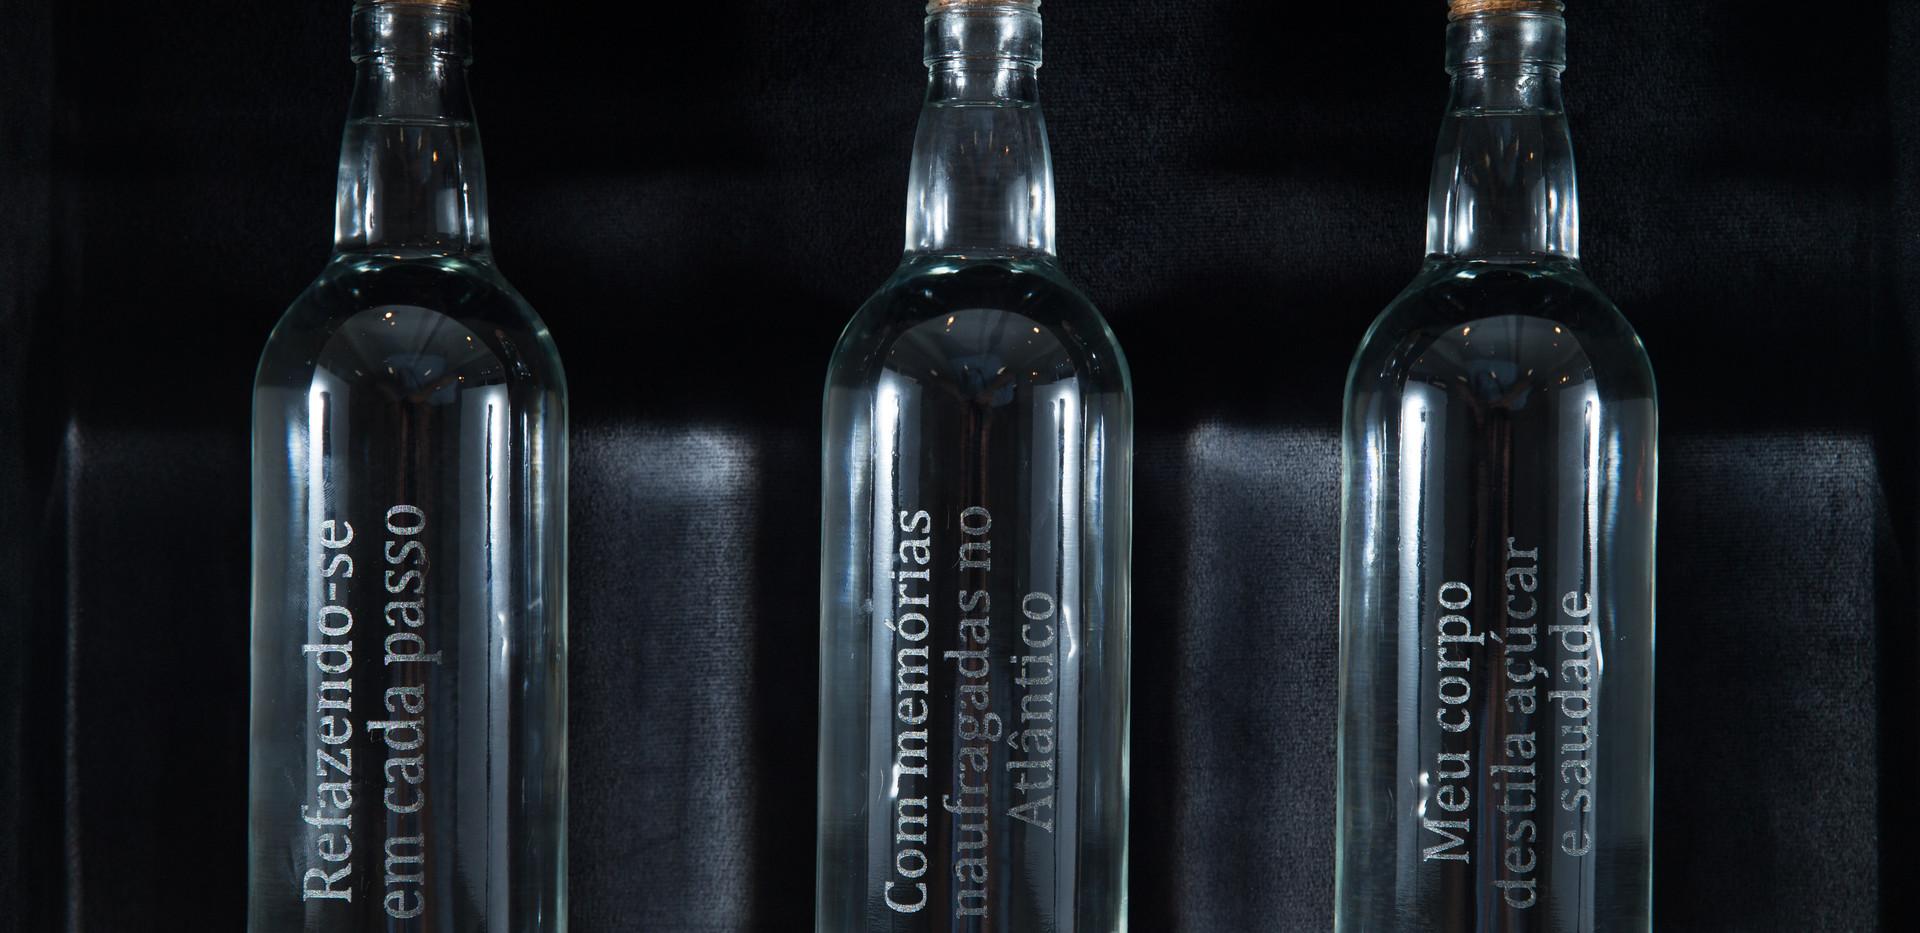 Aguardente / Aguardent (cognac)  | 2018 - Objeto / Object | Cachaça e vidro gravado à laser / Cachaça (cognac) and laser etched glass | 54 x 38 x 14 cm